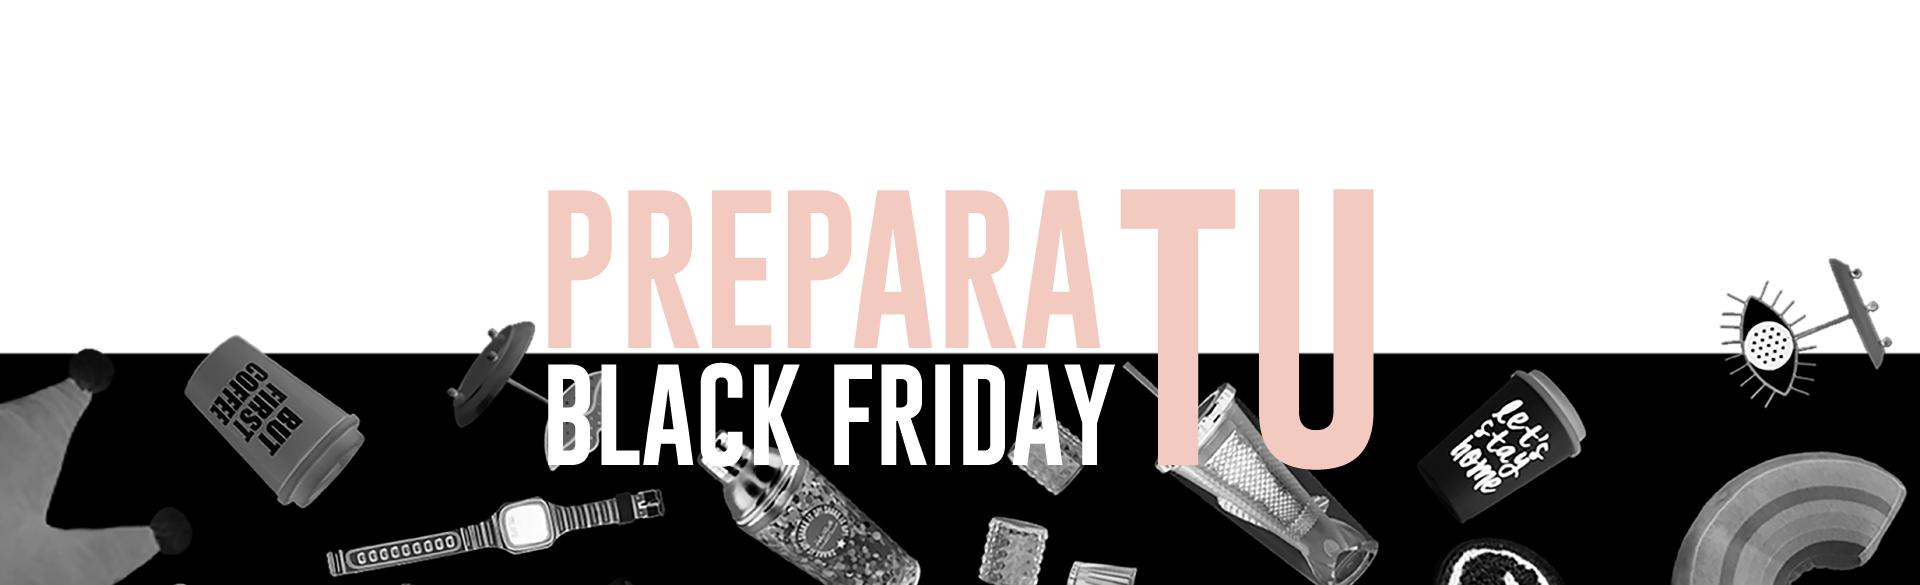 PREPARA TU Black Friday